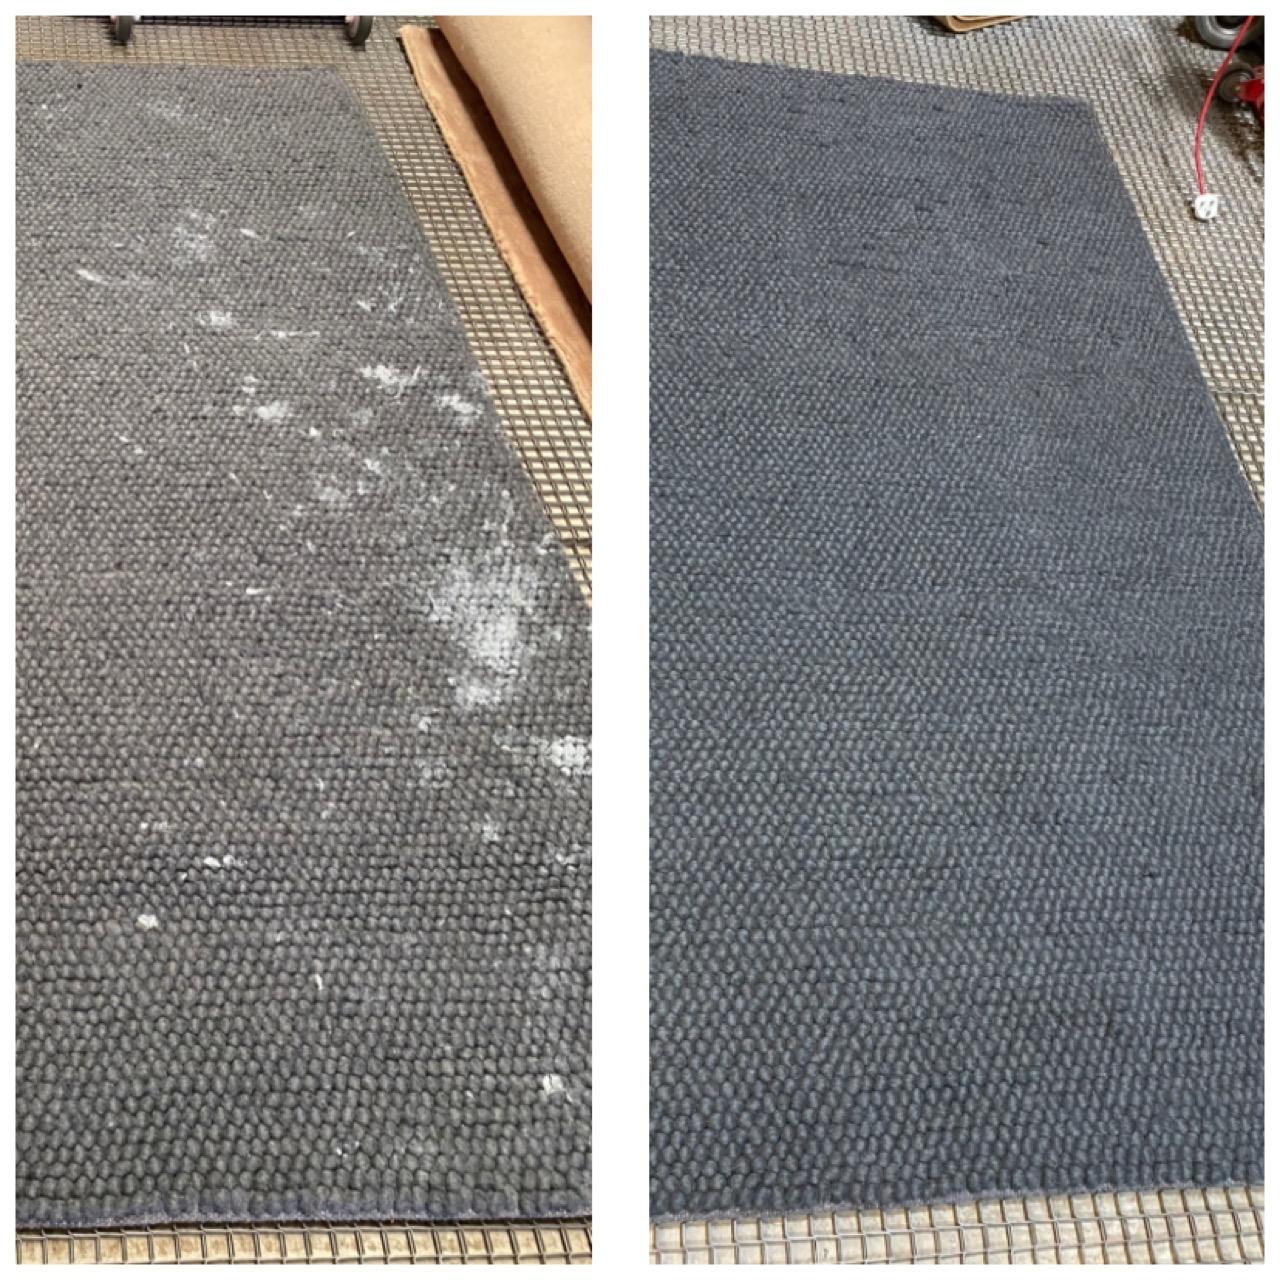 Northwich rug spa